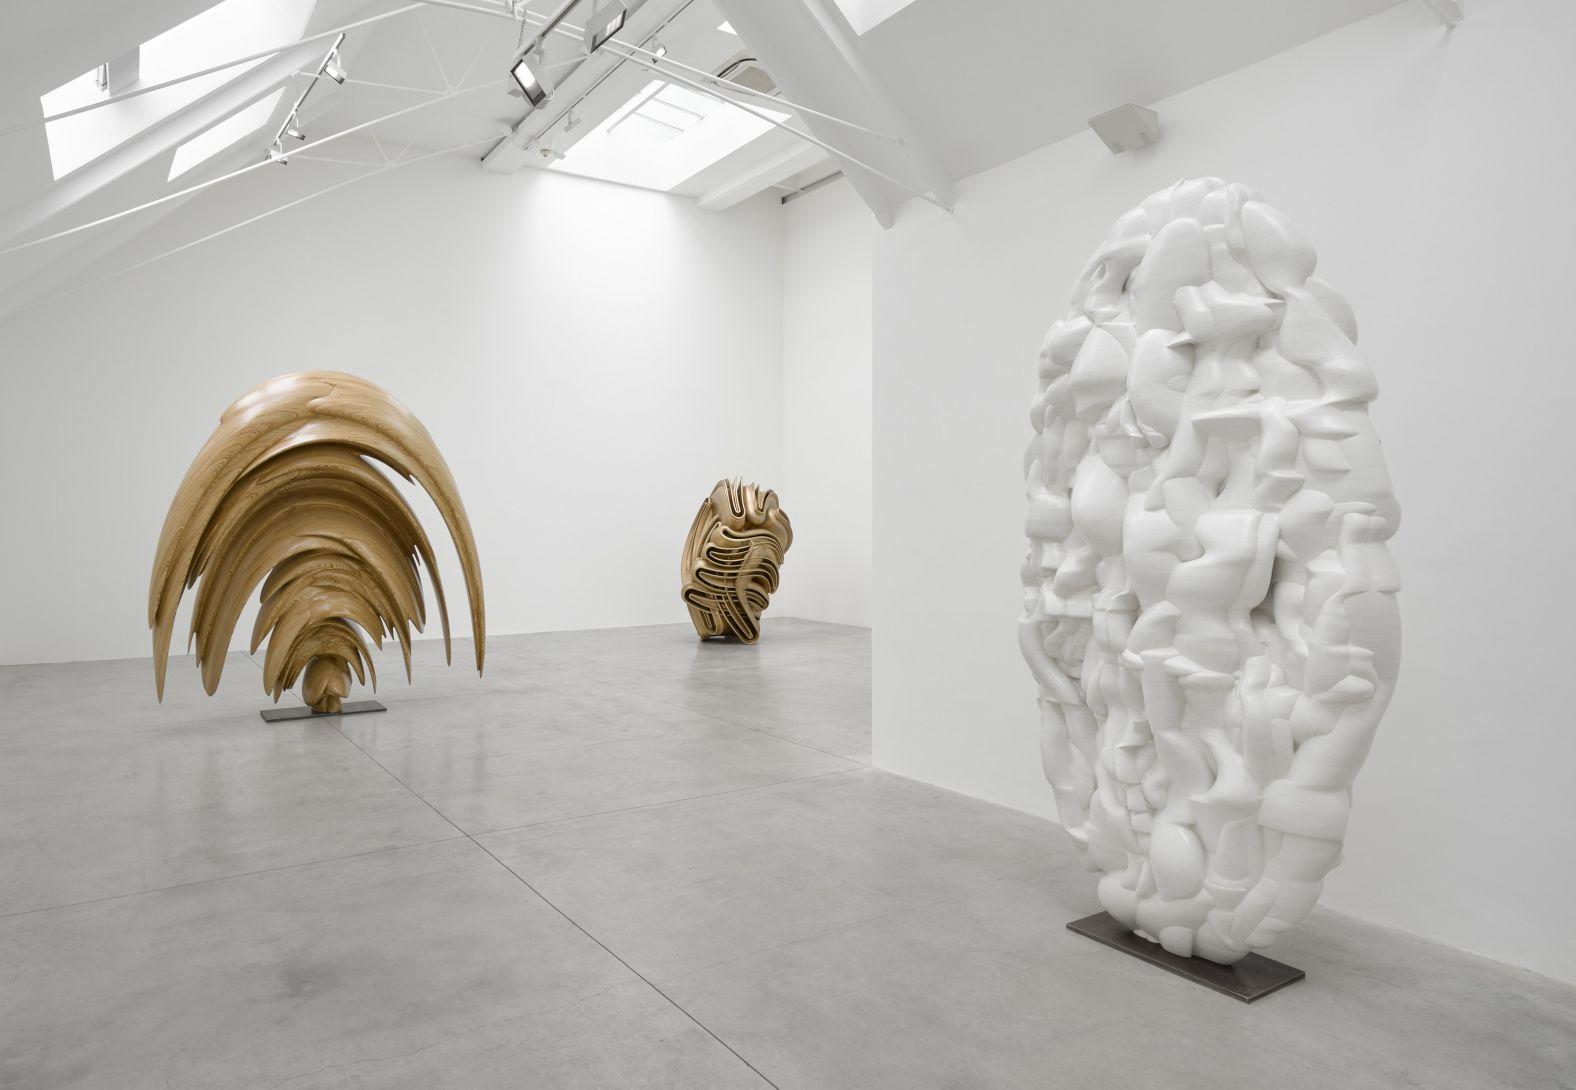 Tony Cragg at Lisson Gallery, 1 October – 5 November 2016